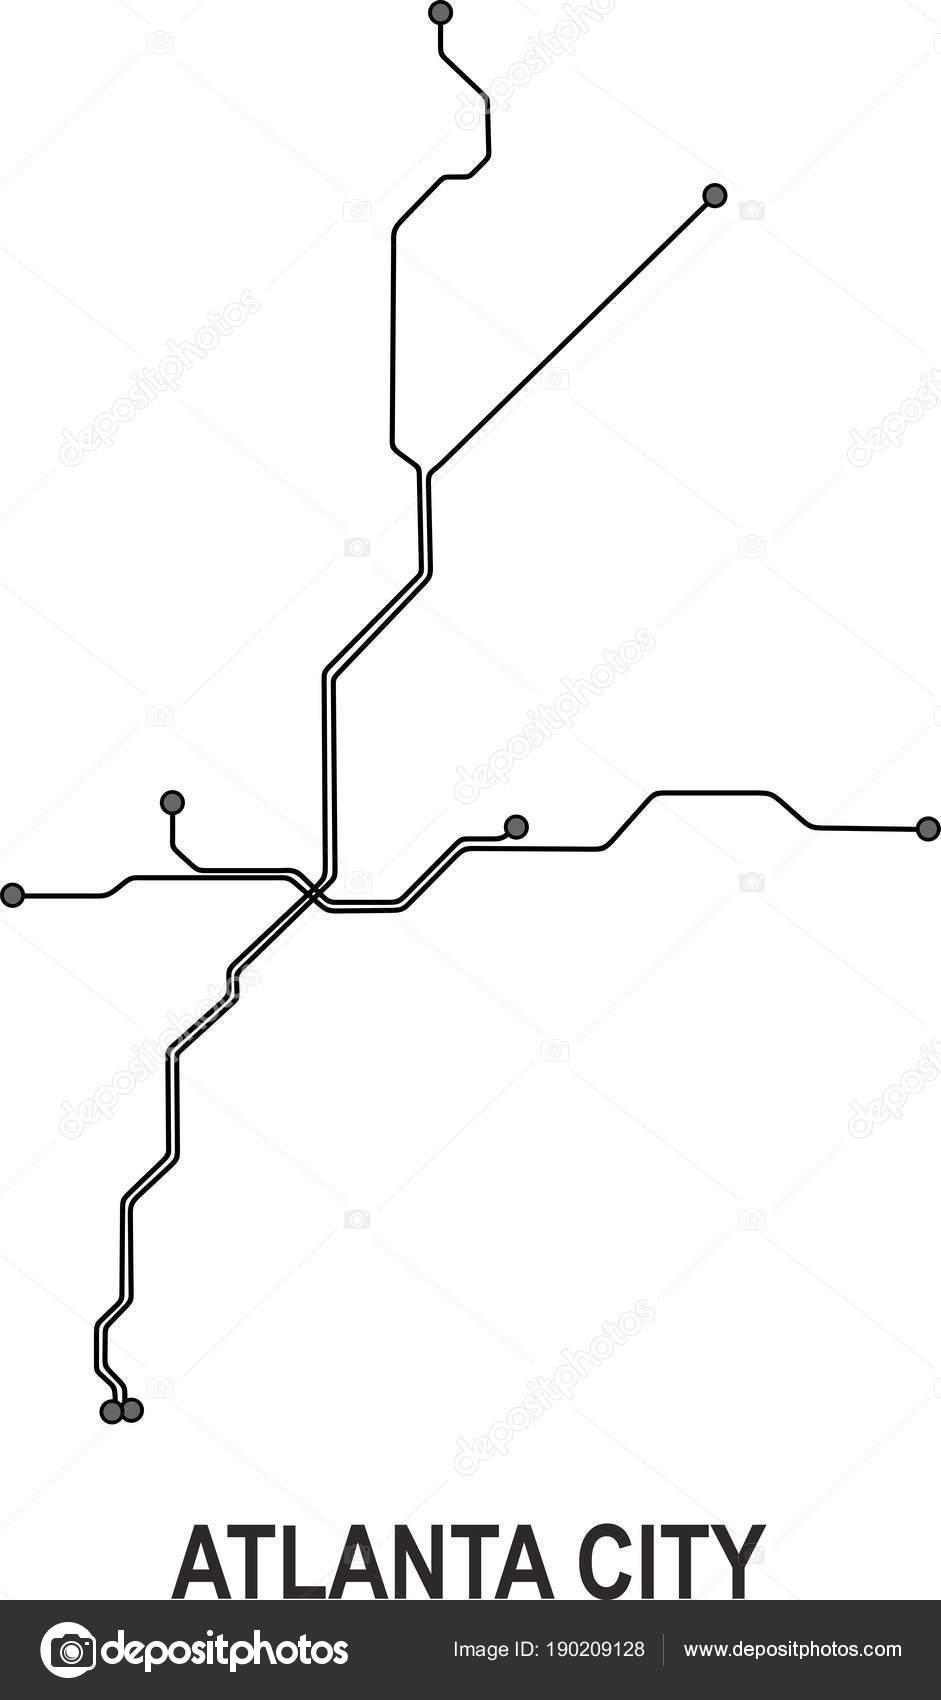 Atlanta Subway Map Vector File Format Stock Vector C Fishvector